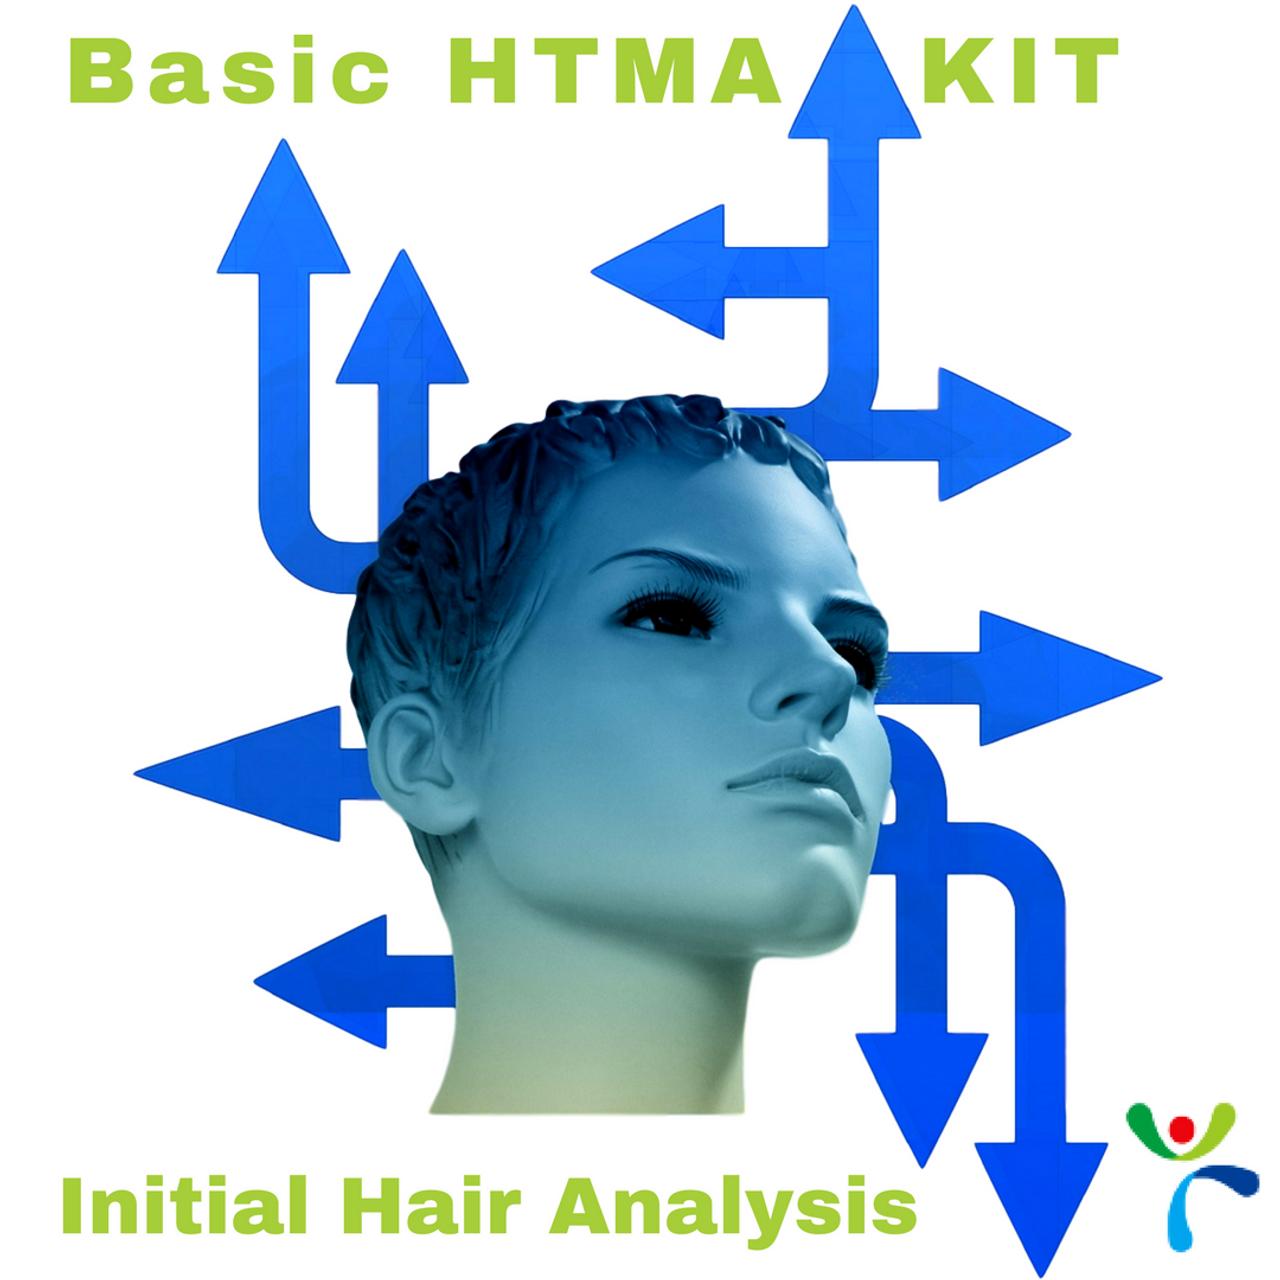 Basic Hair Analysis Kit - Initial